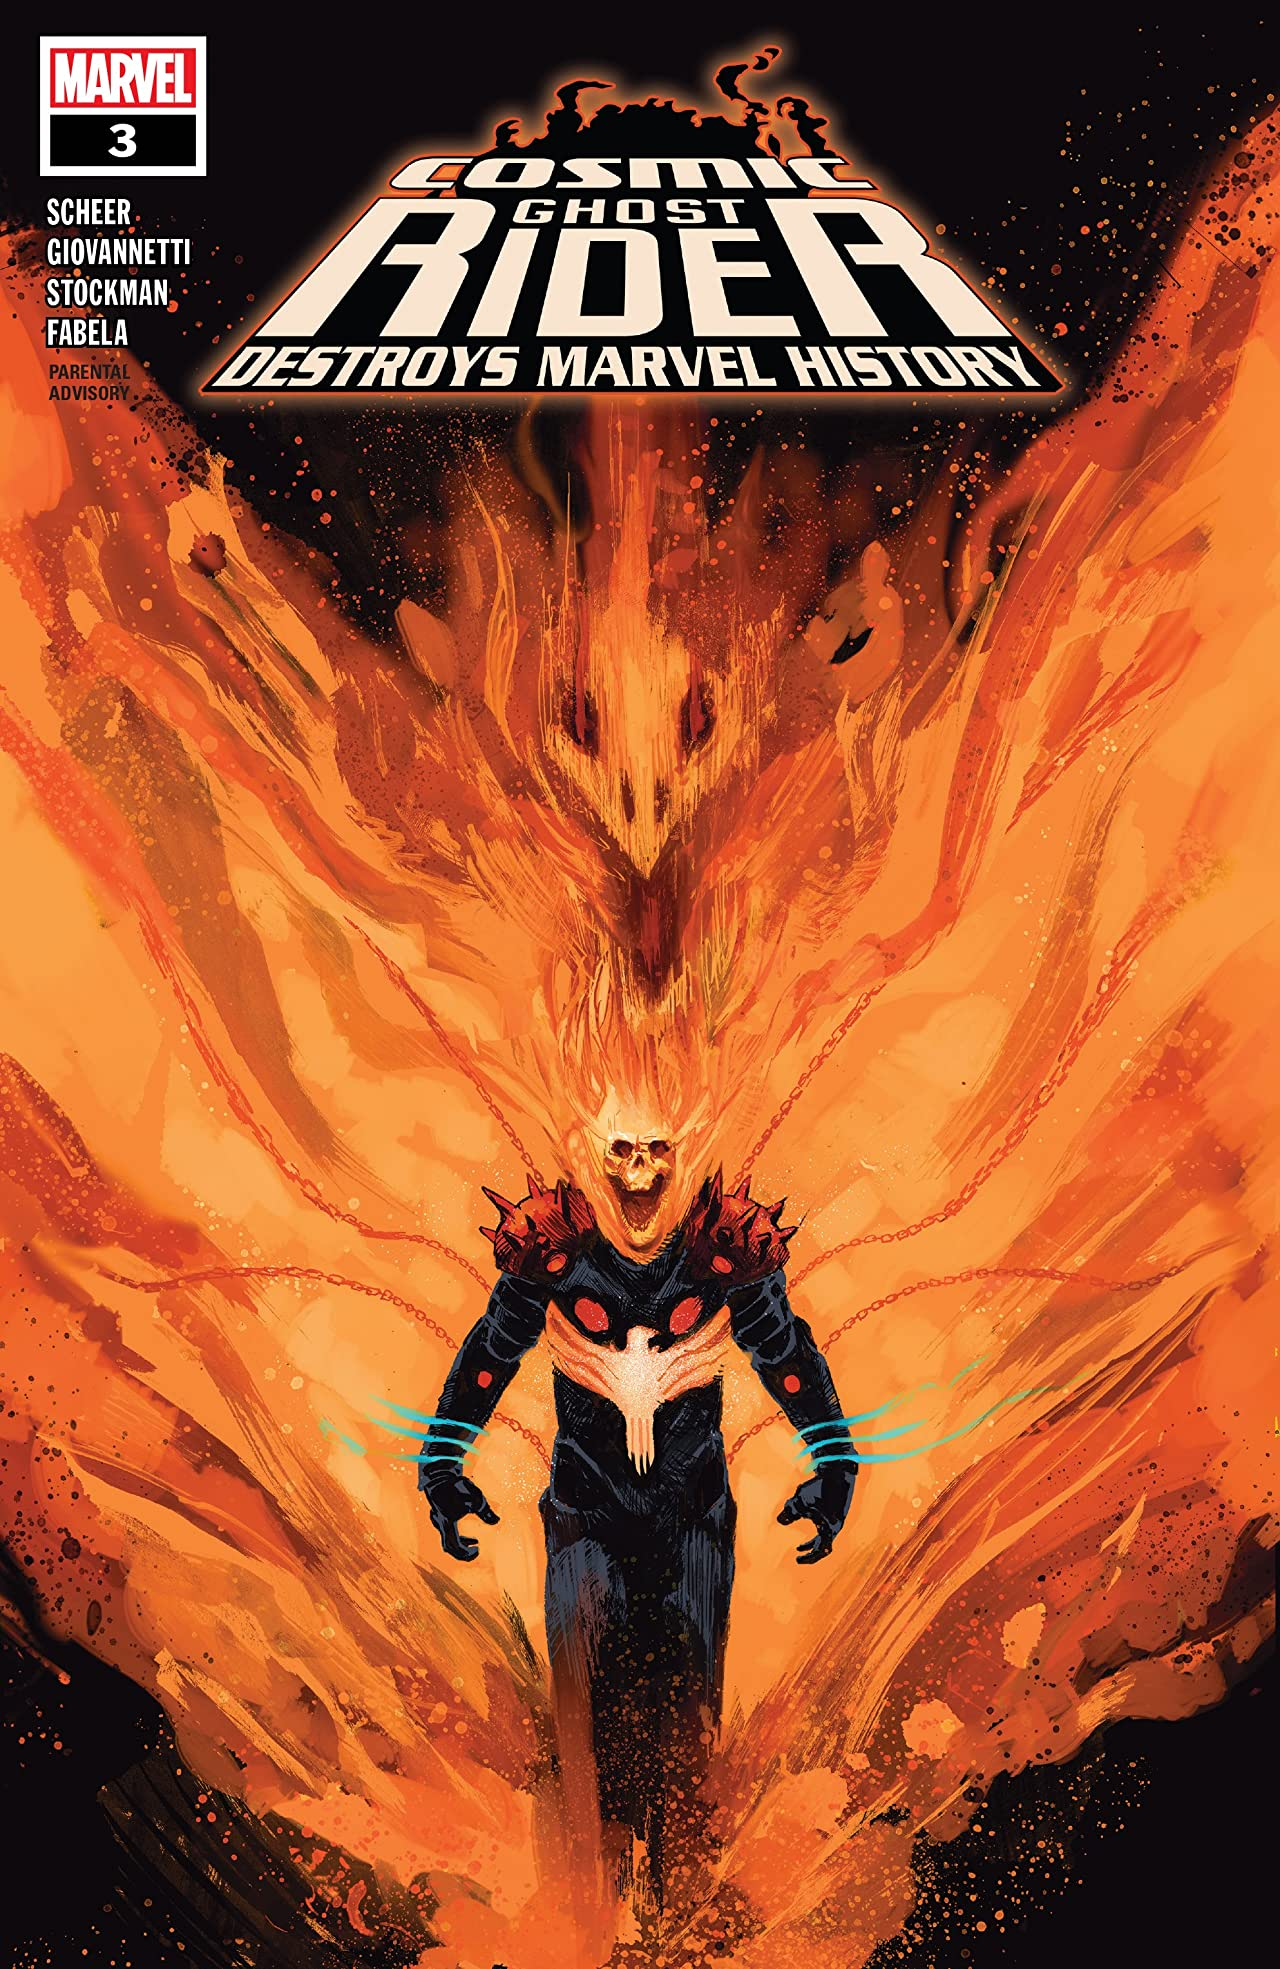 Cosmic Ghost Rider Destroys Marvel History (2019) No.3 (sur 6)